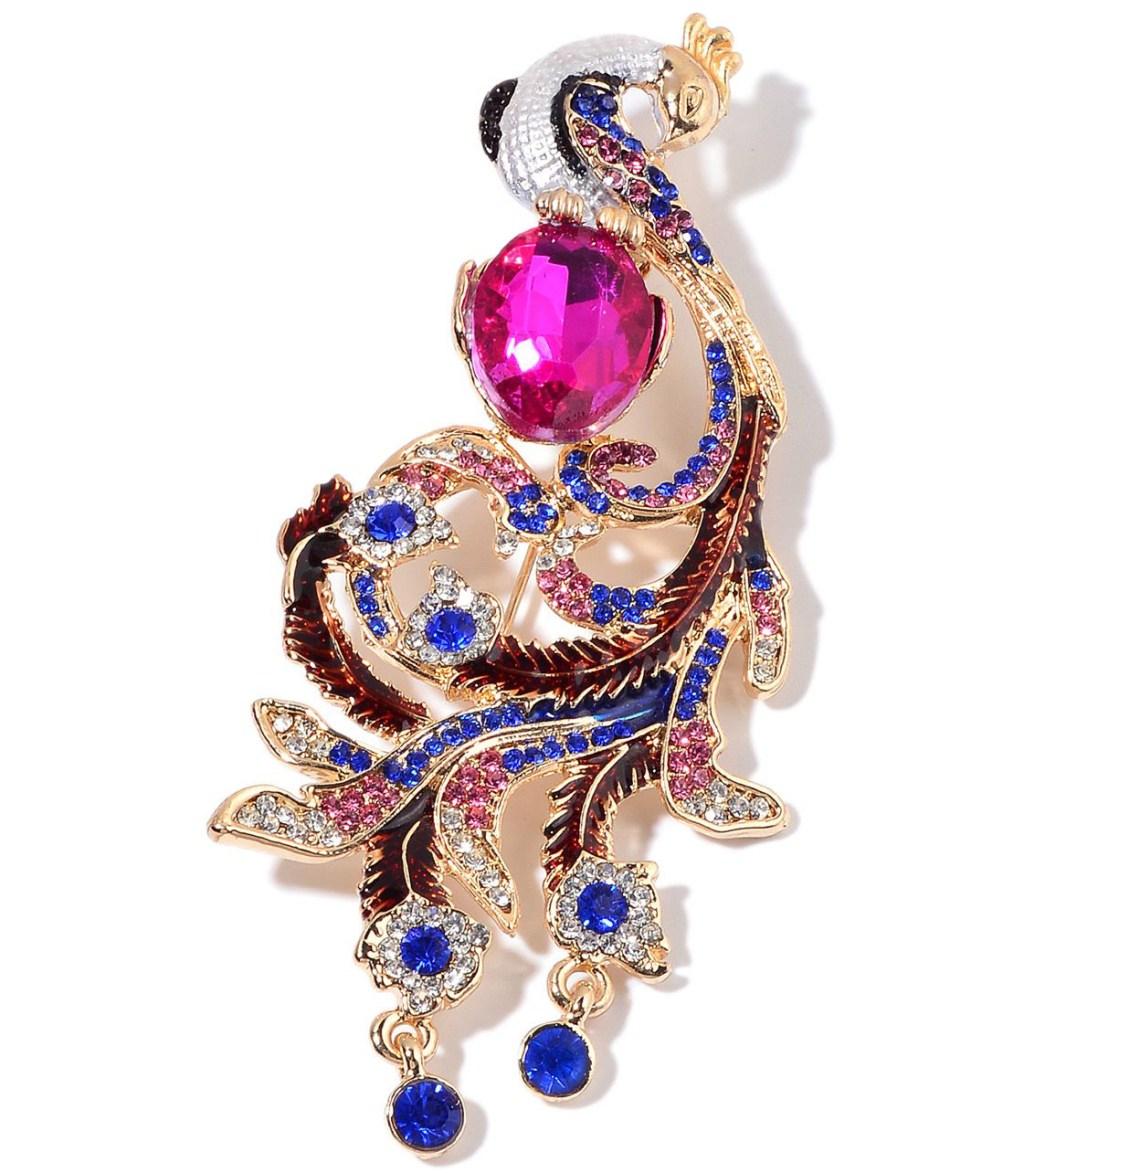 Fashion Week Roundup Jewelry - Austrian Crystal Peacock Brooch